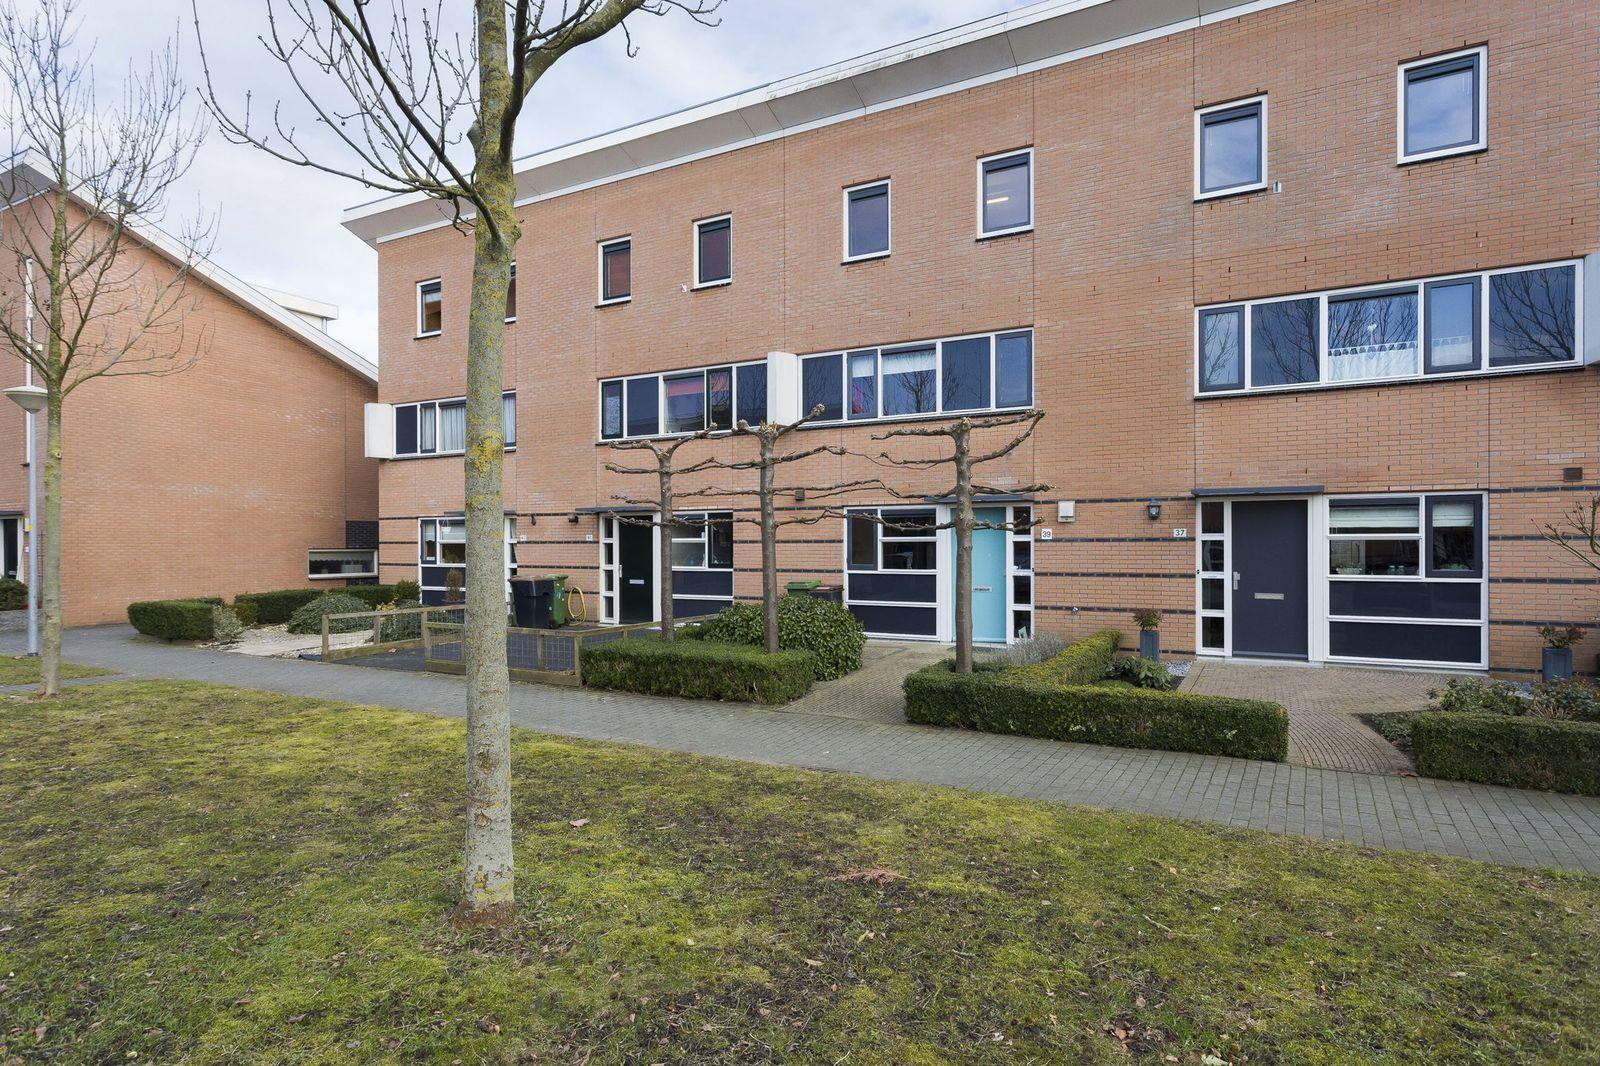 Swaenstein 39, Nieuw-vennep